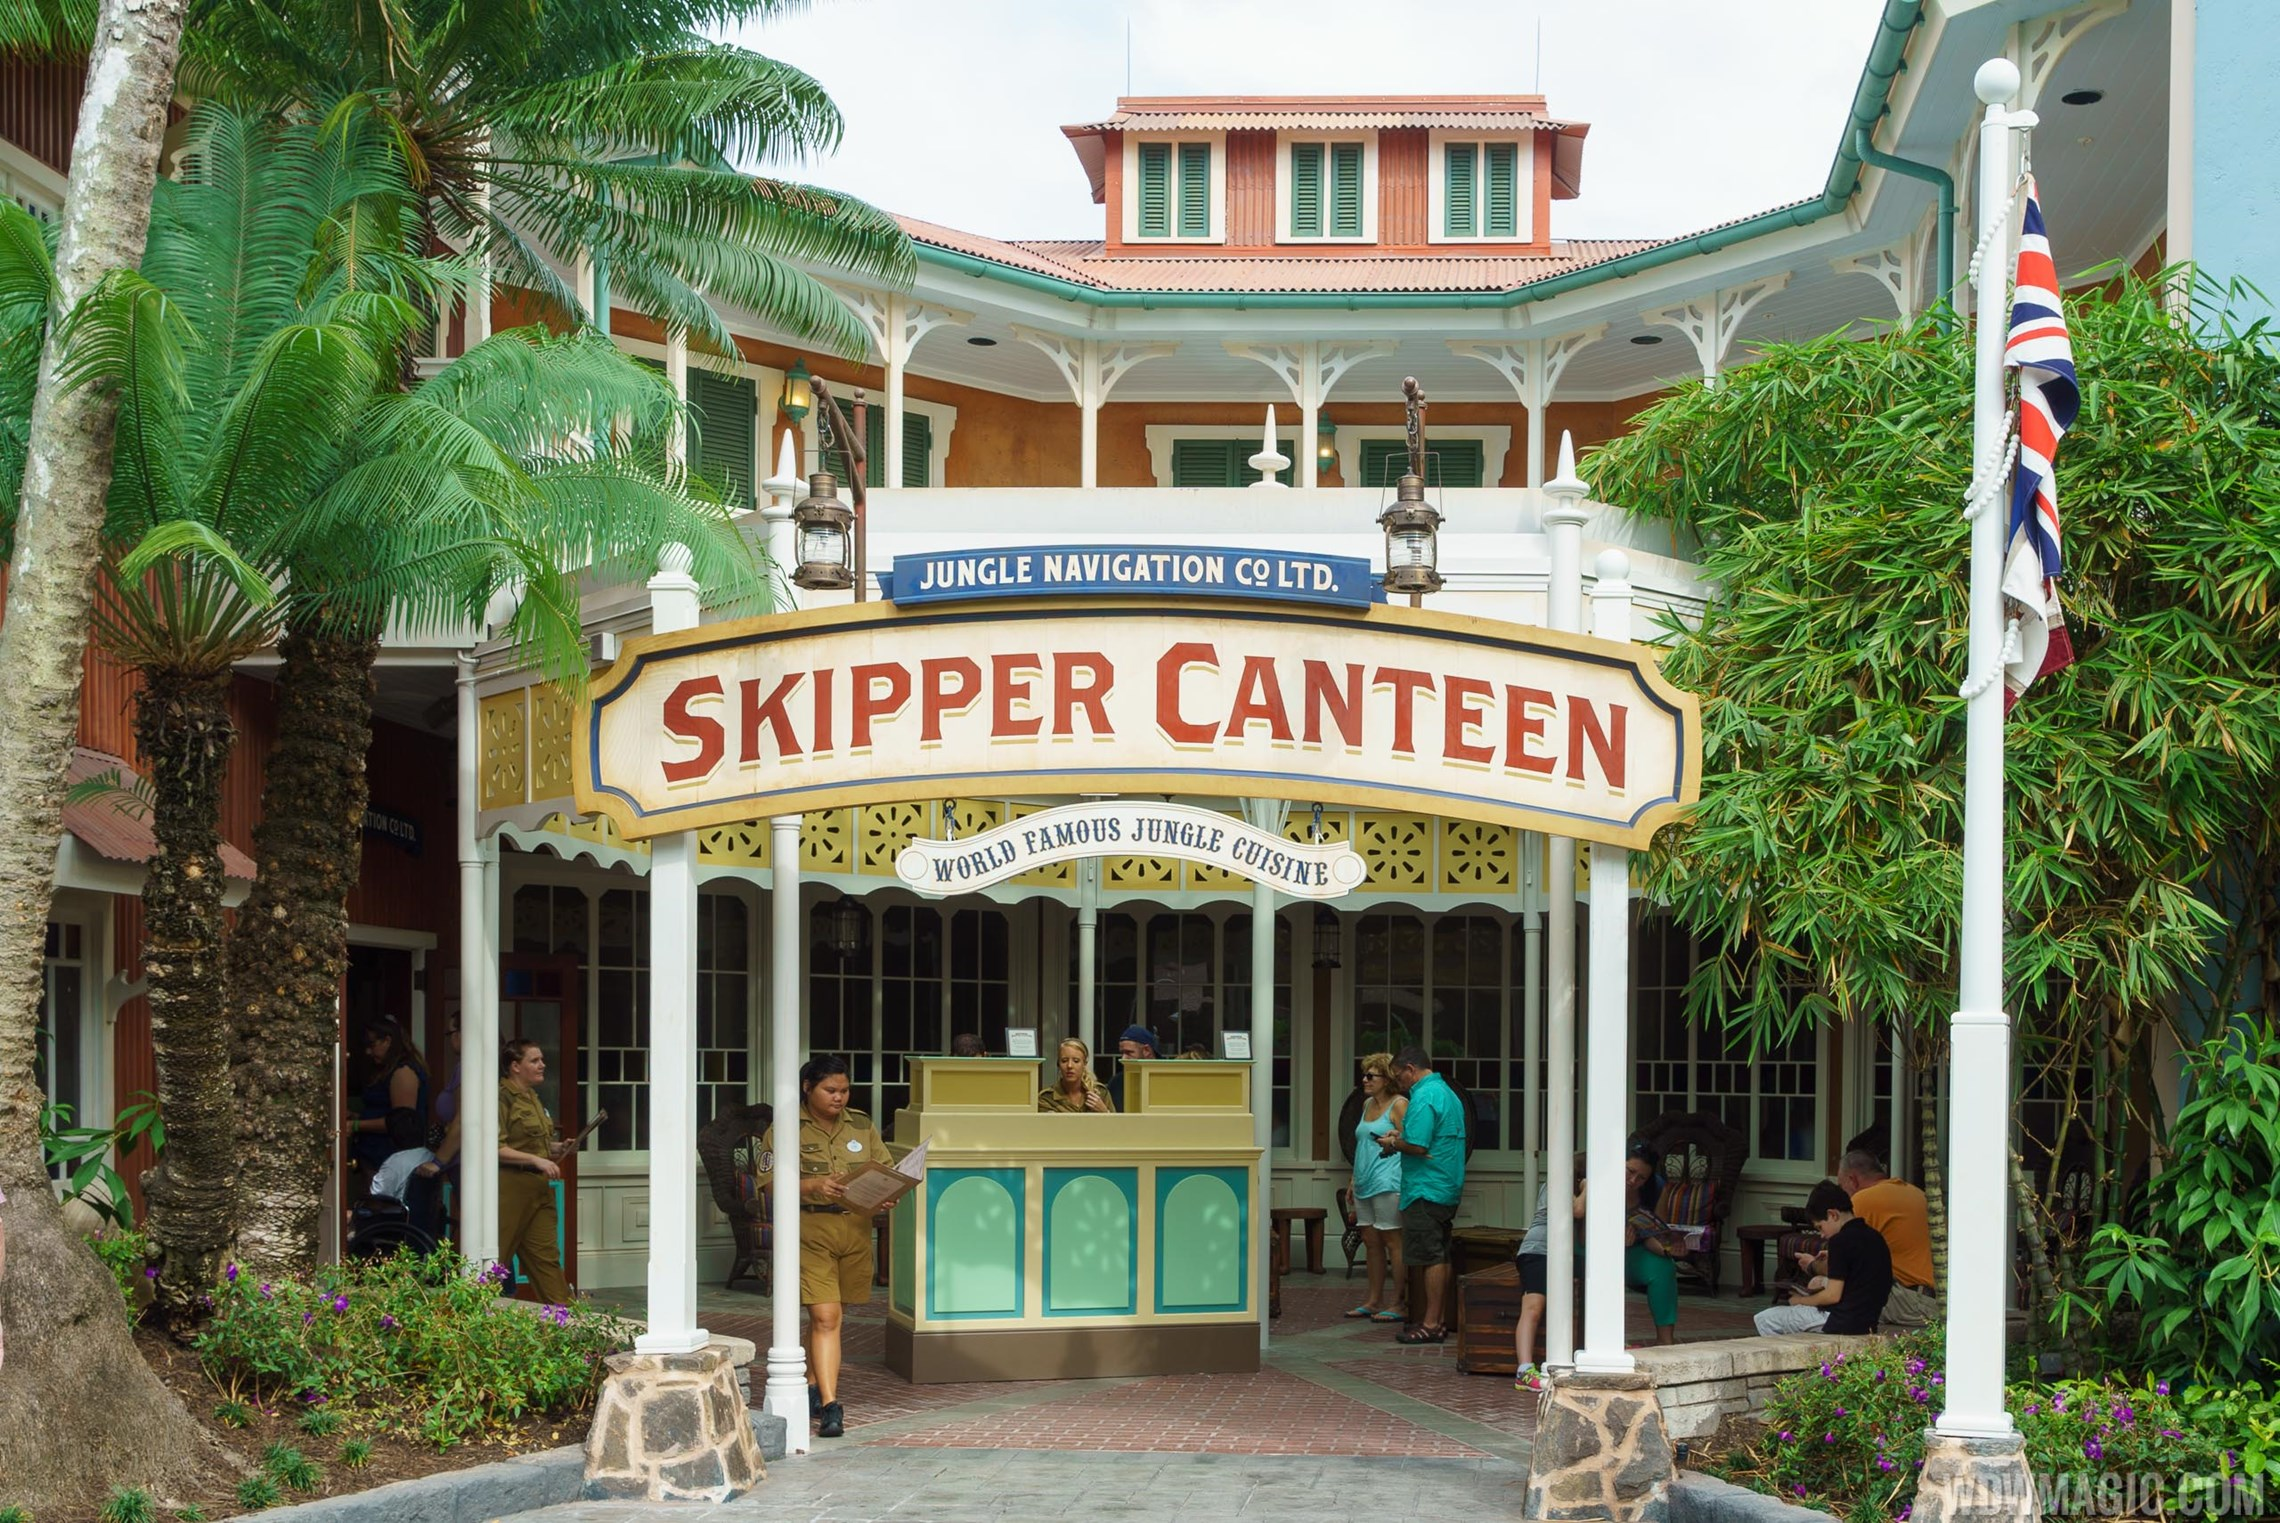 Jungle Cruise Skipper Canteen overview